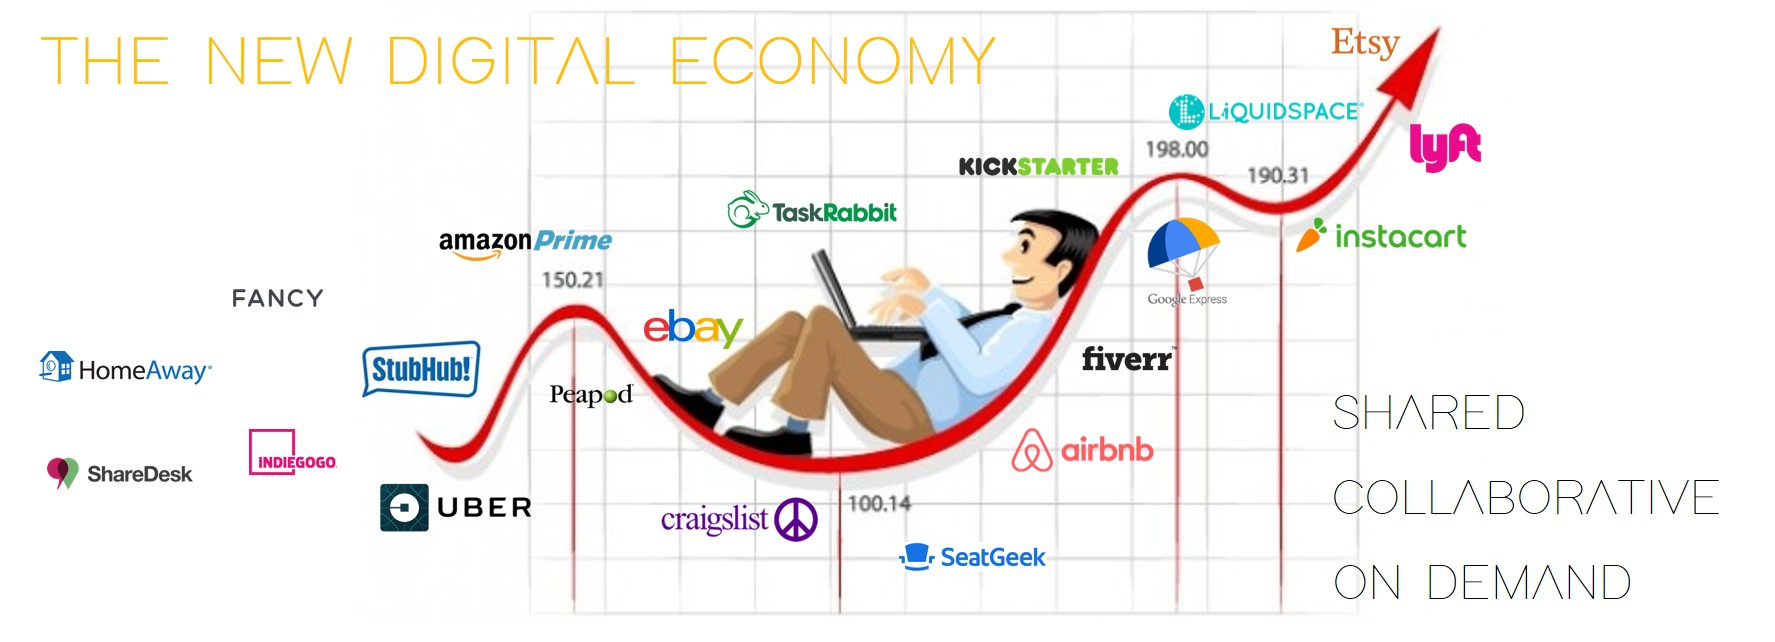 New Digital Economy banner